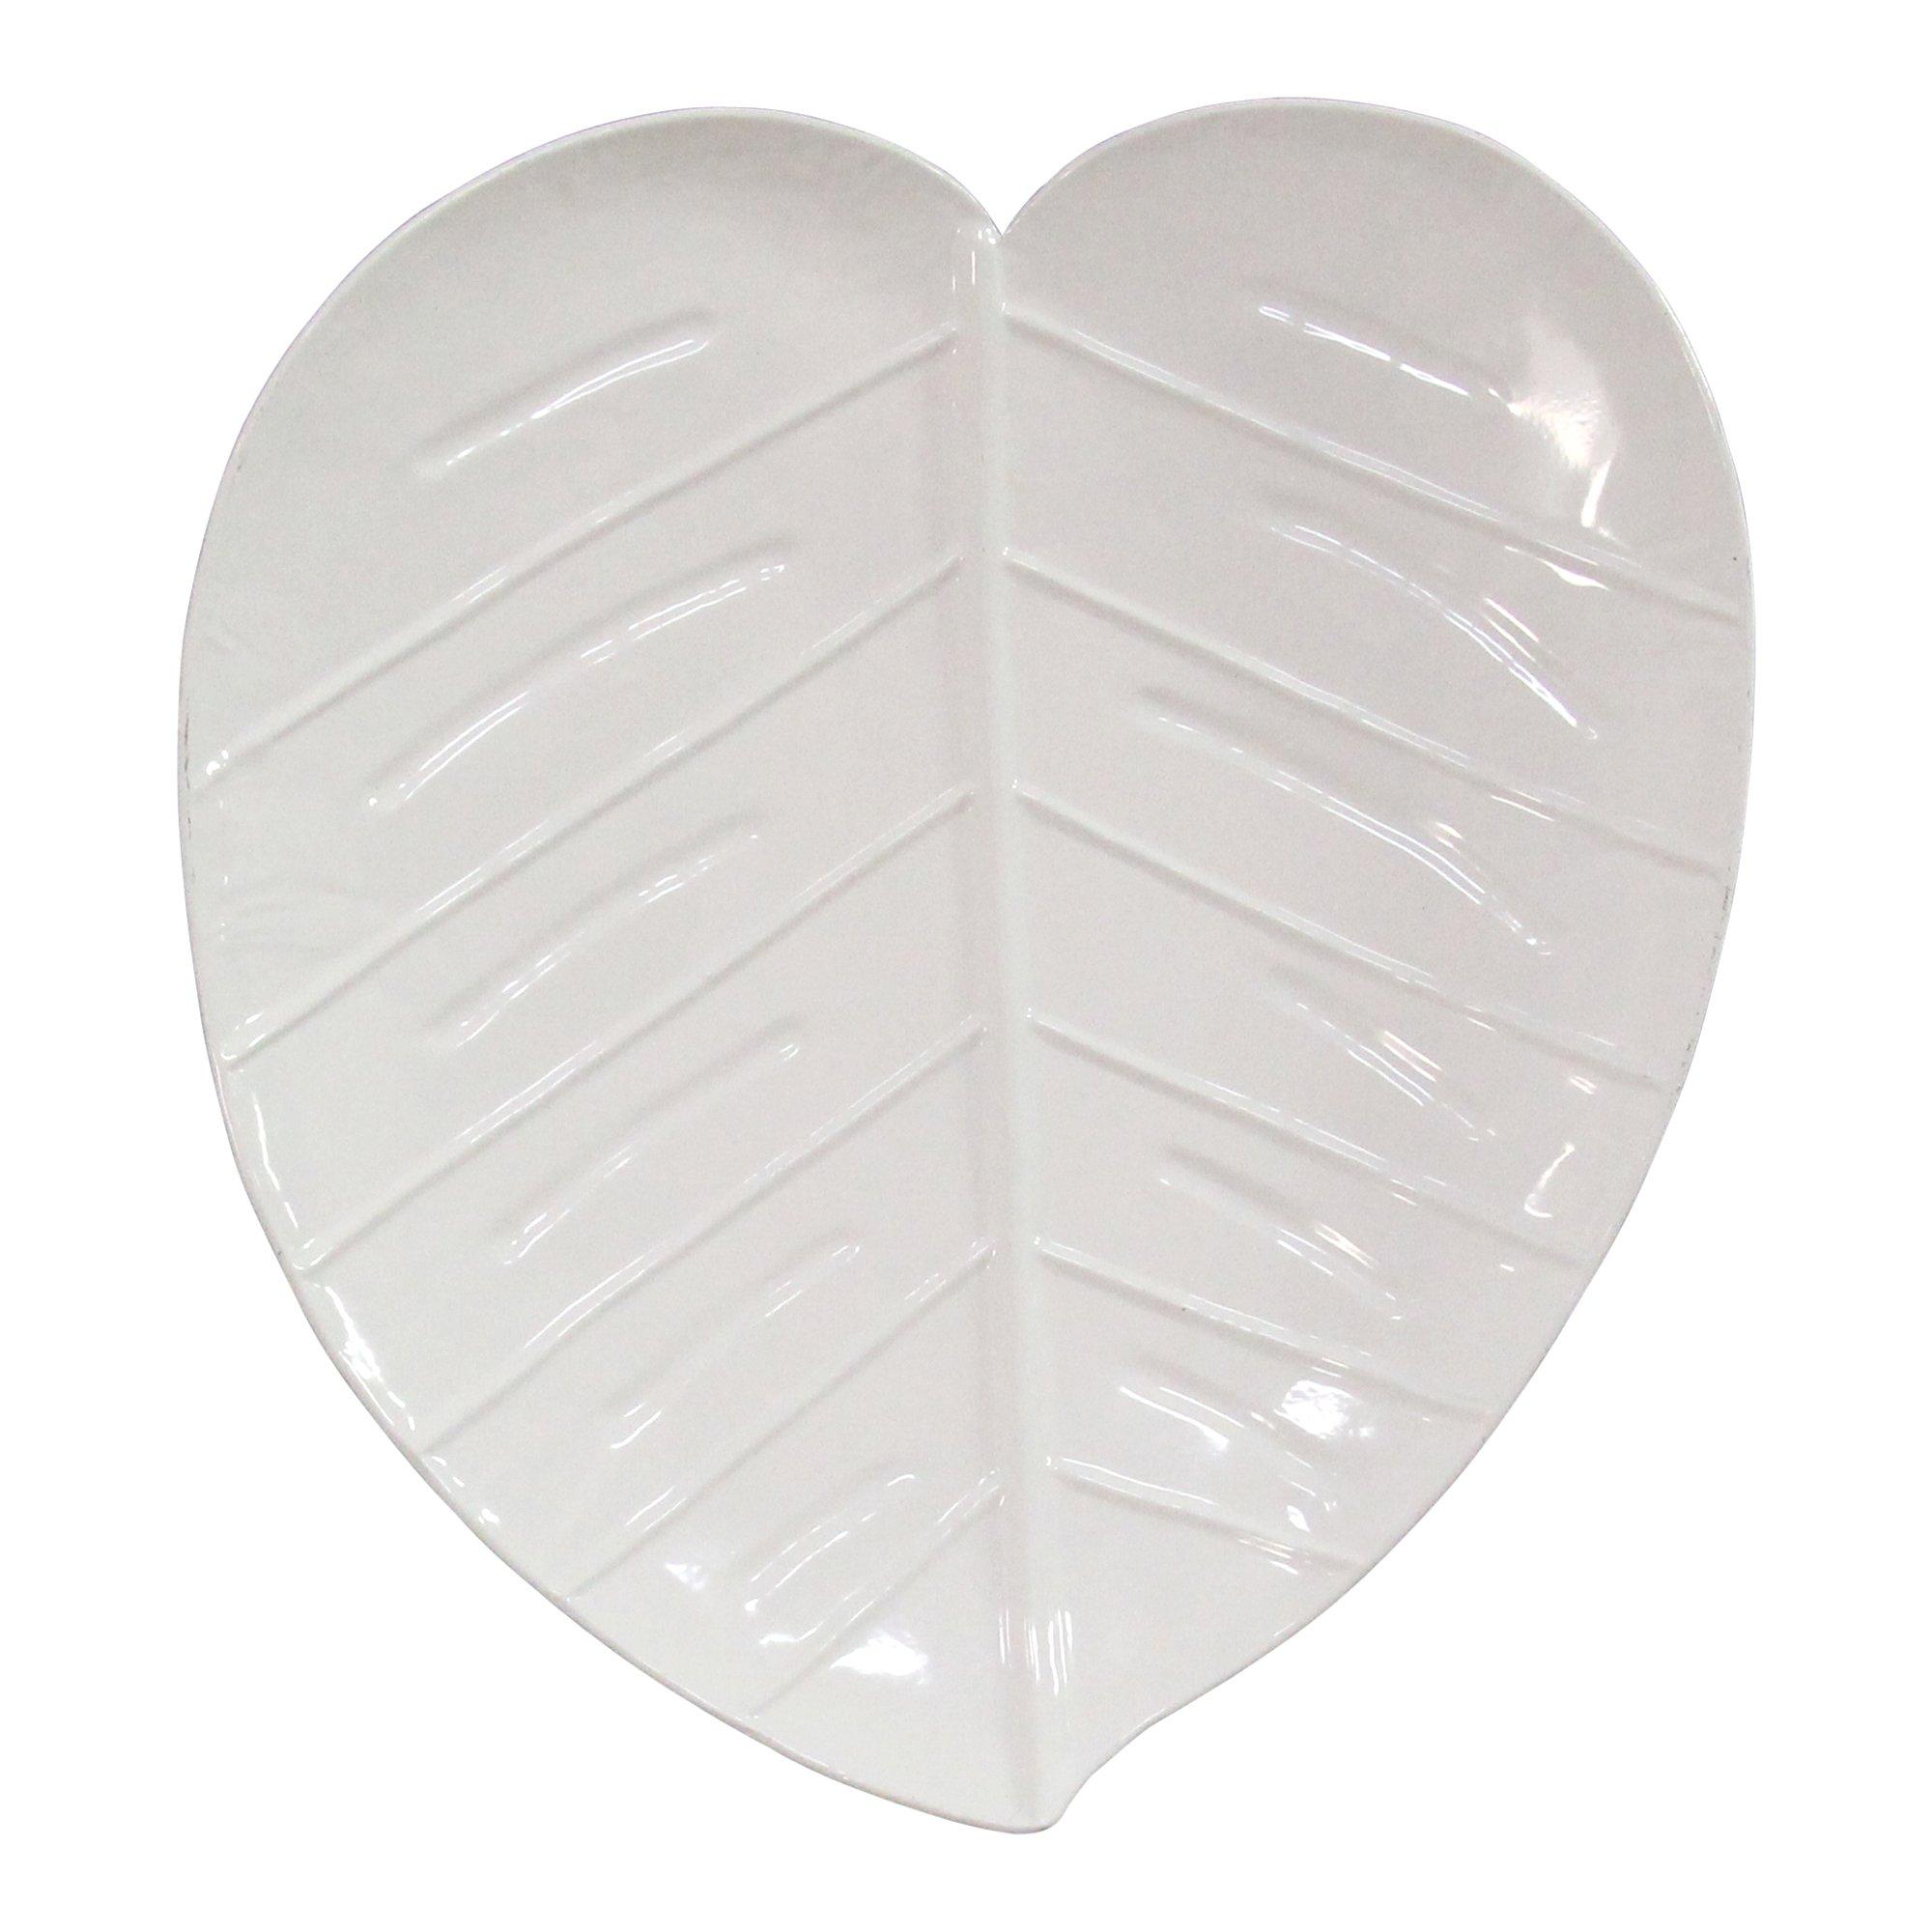 Glossy-White Decorative Metal Leaf